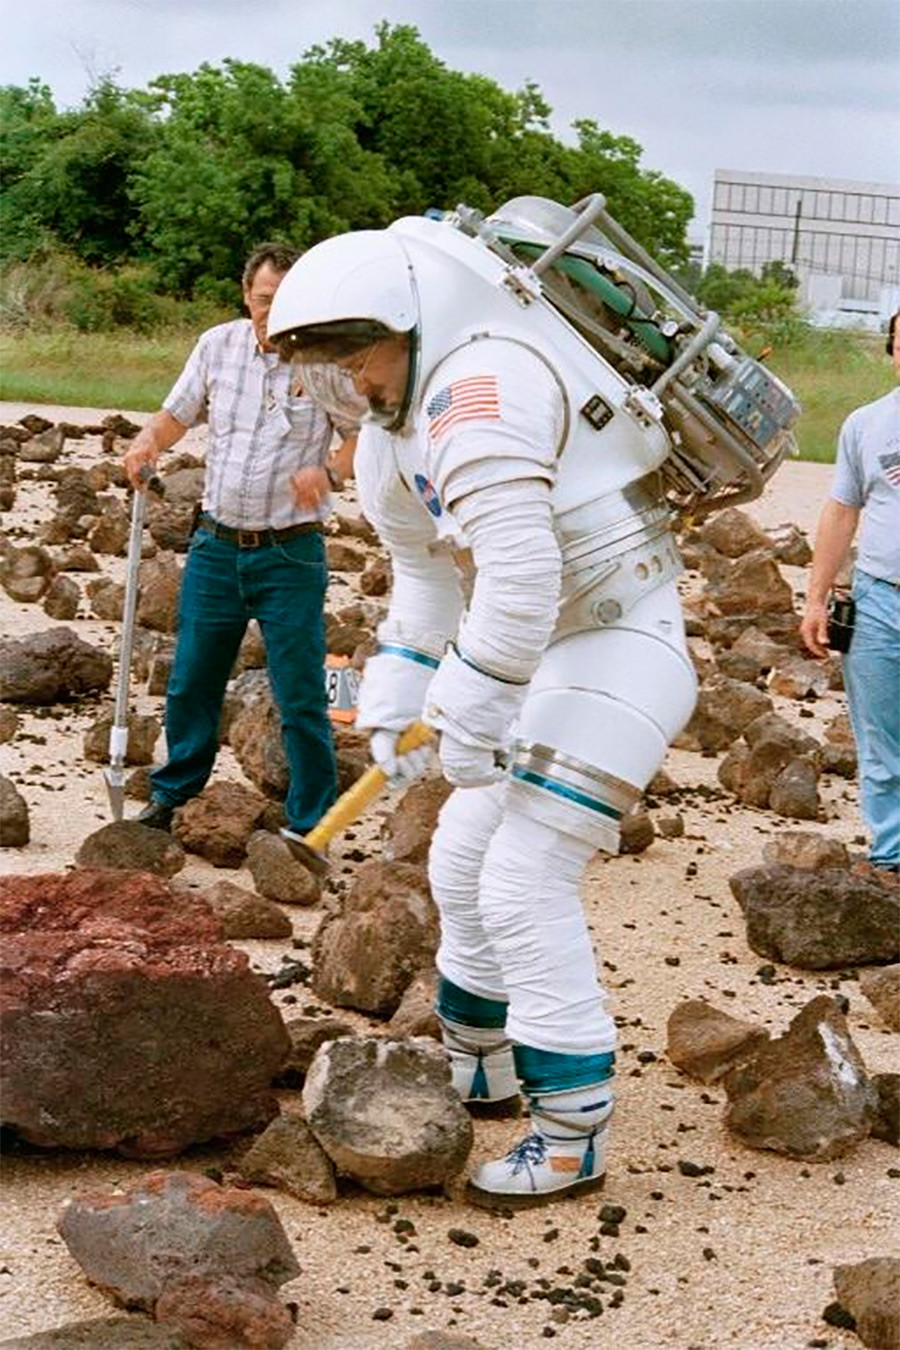 a 70 kg astronaut in space walking outside - photo #37